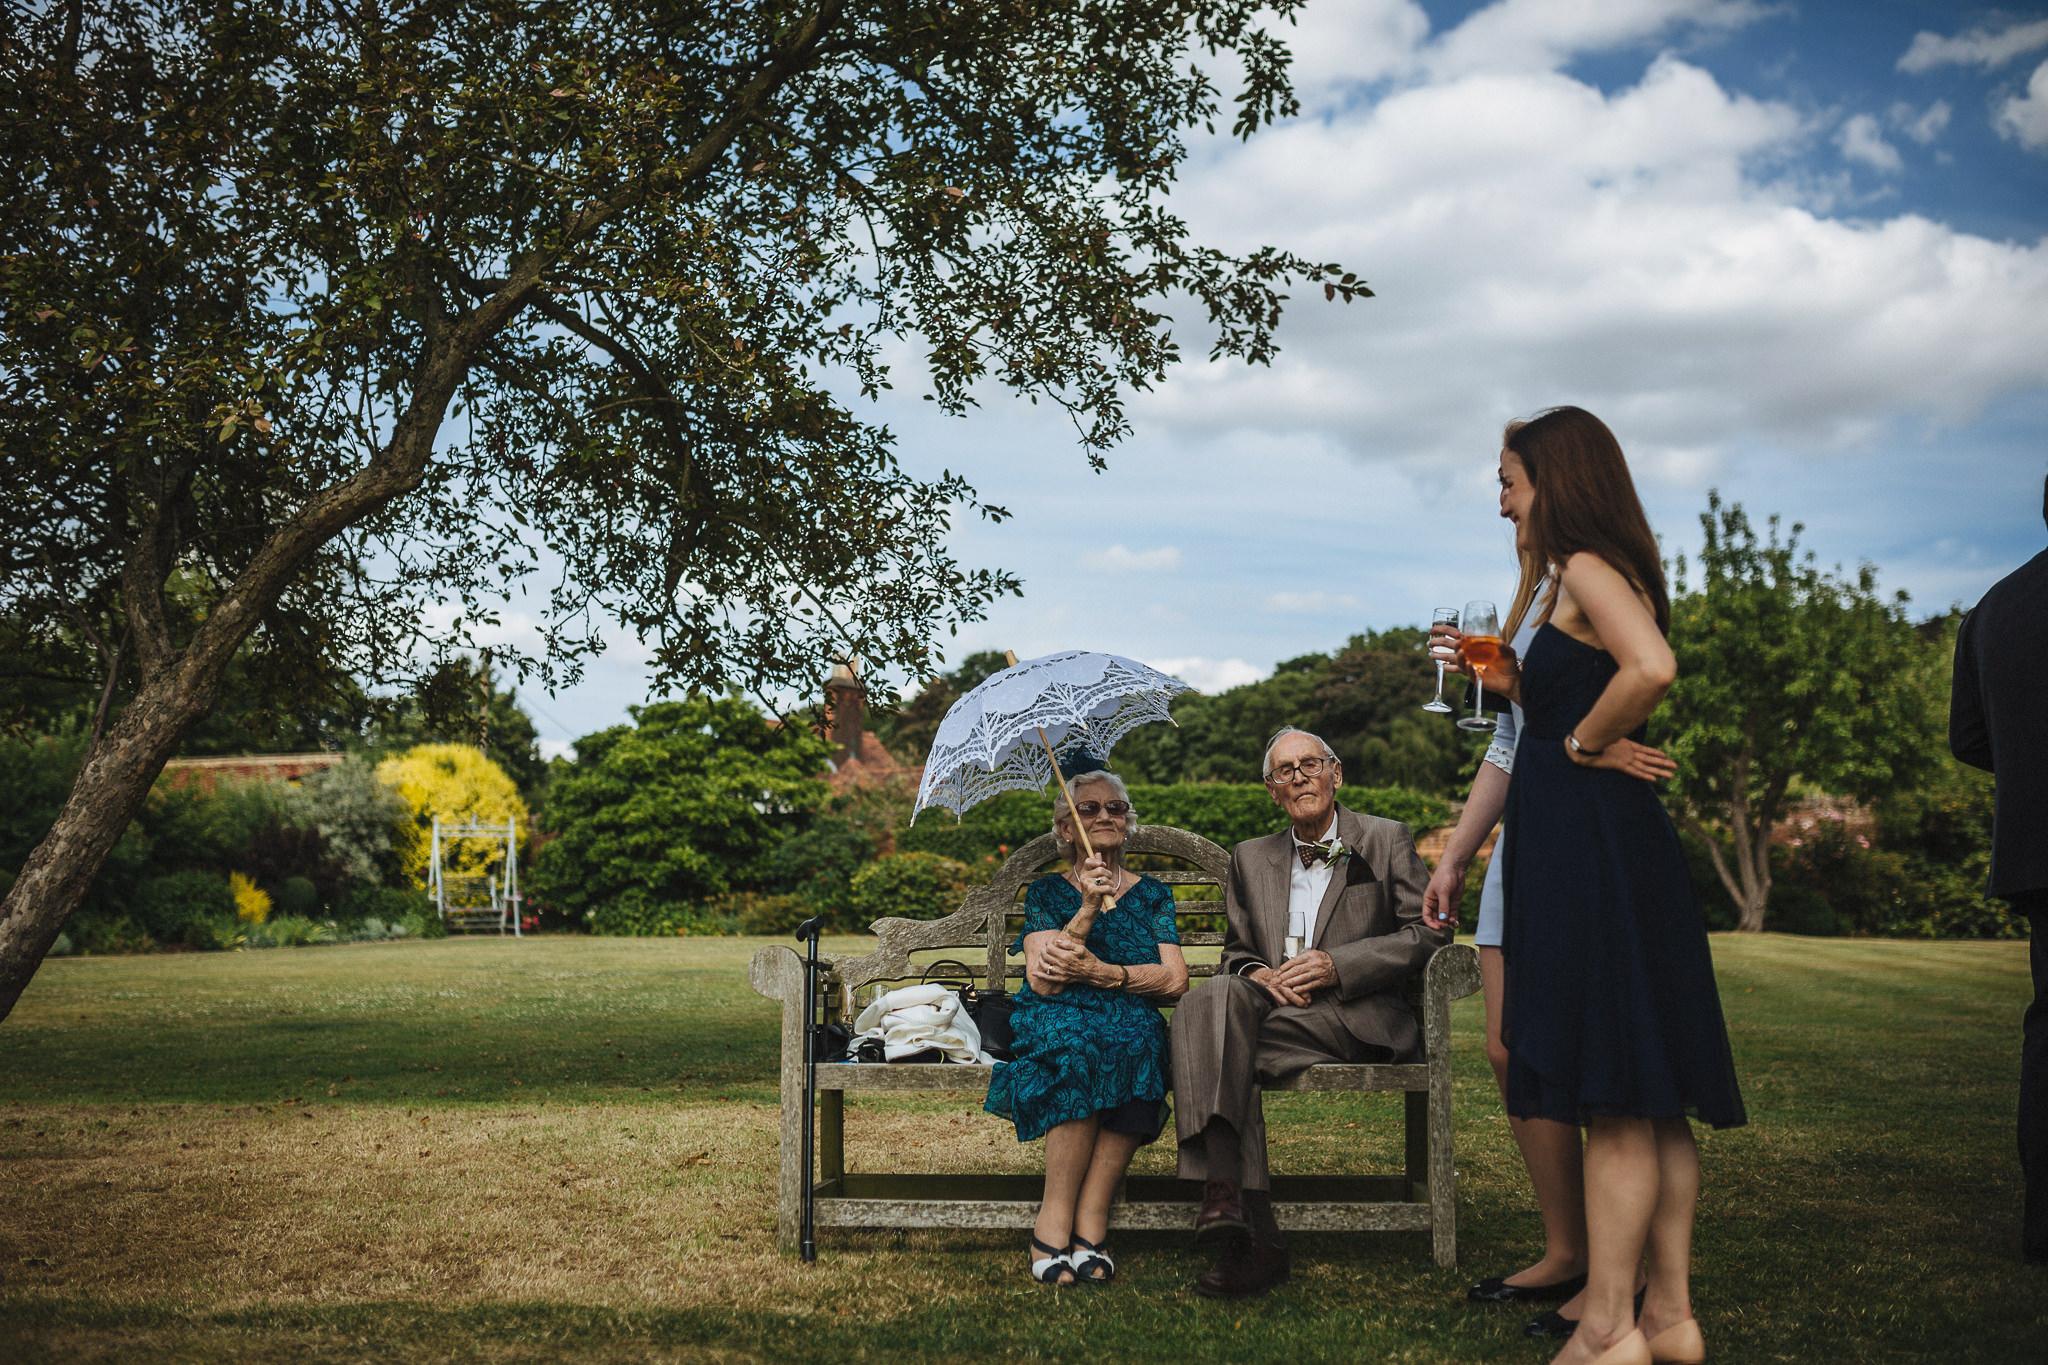 paul-marbrook-Gaynes-Park Wedding-Photographer-90088